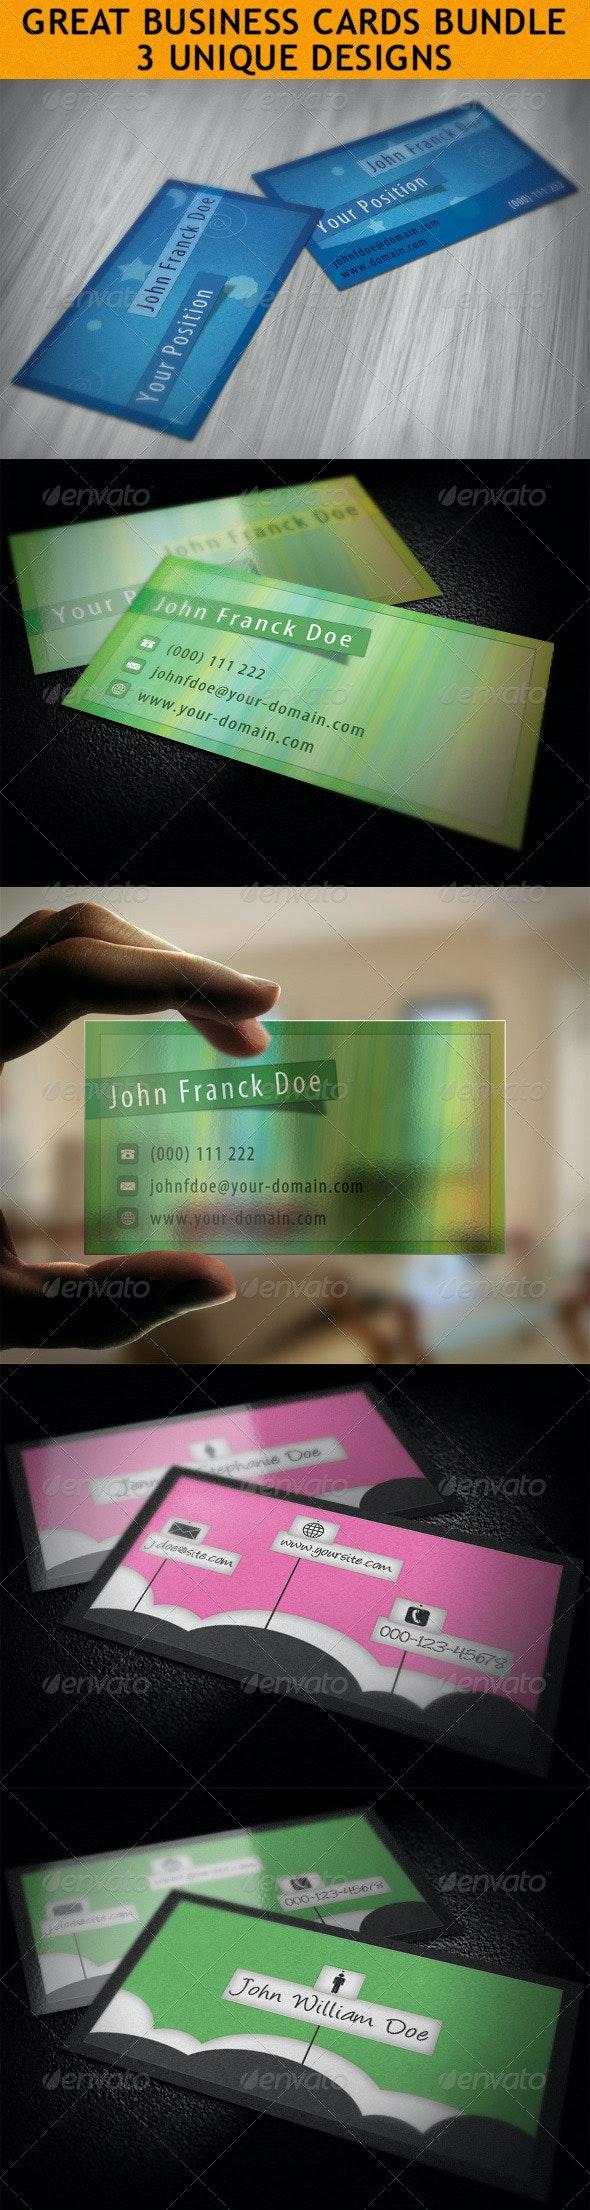 Business Cards Bundle Vol. 2 - Creative Business Cards